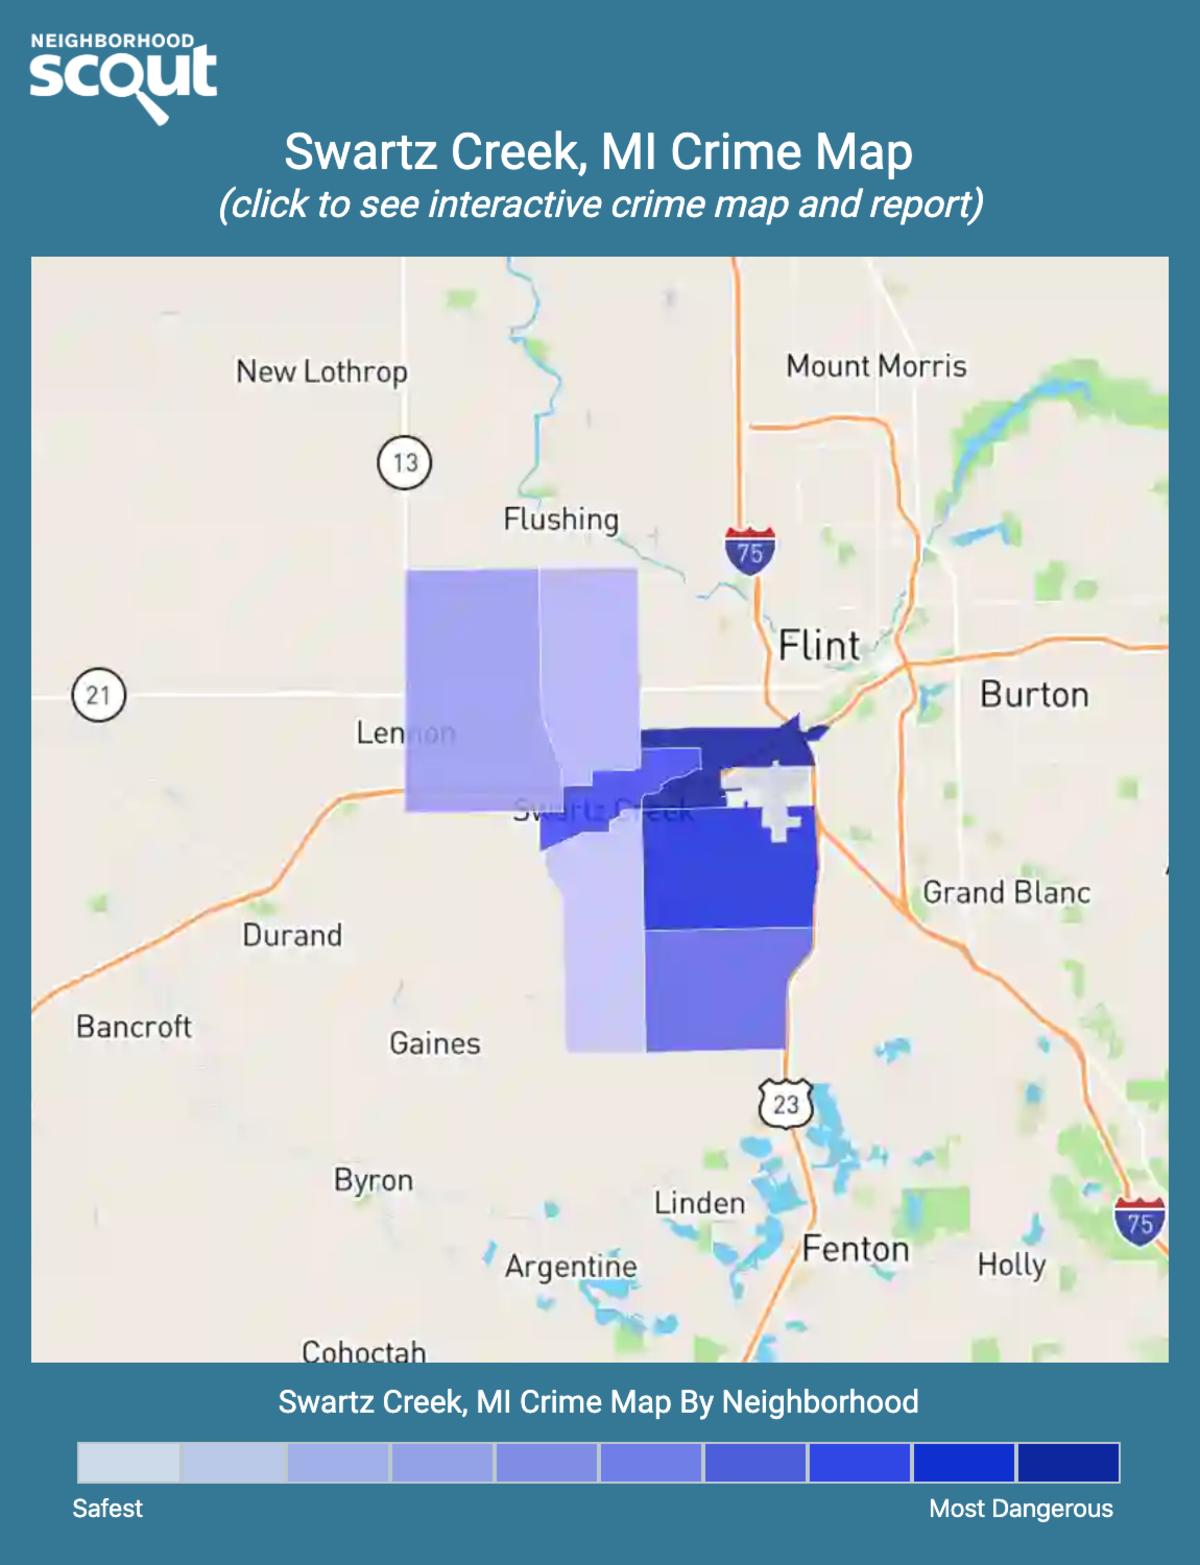 Swartz Creek, Michigan crime map